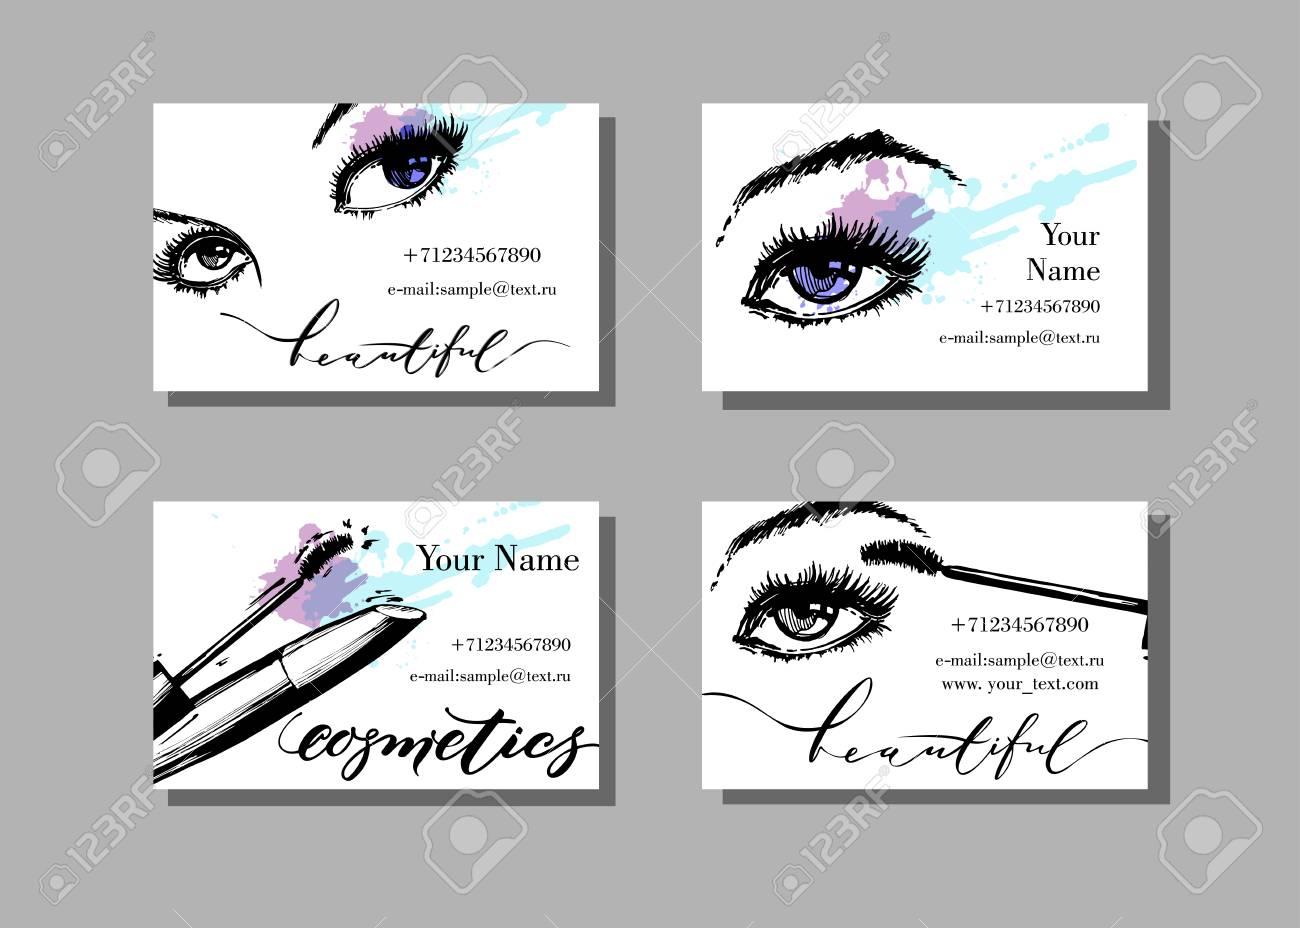 Makeup artist business card vector template with makeup items makeup artist business card vector template with makeup items pattern with beautiful female eyes colourmoves